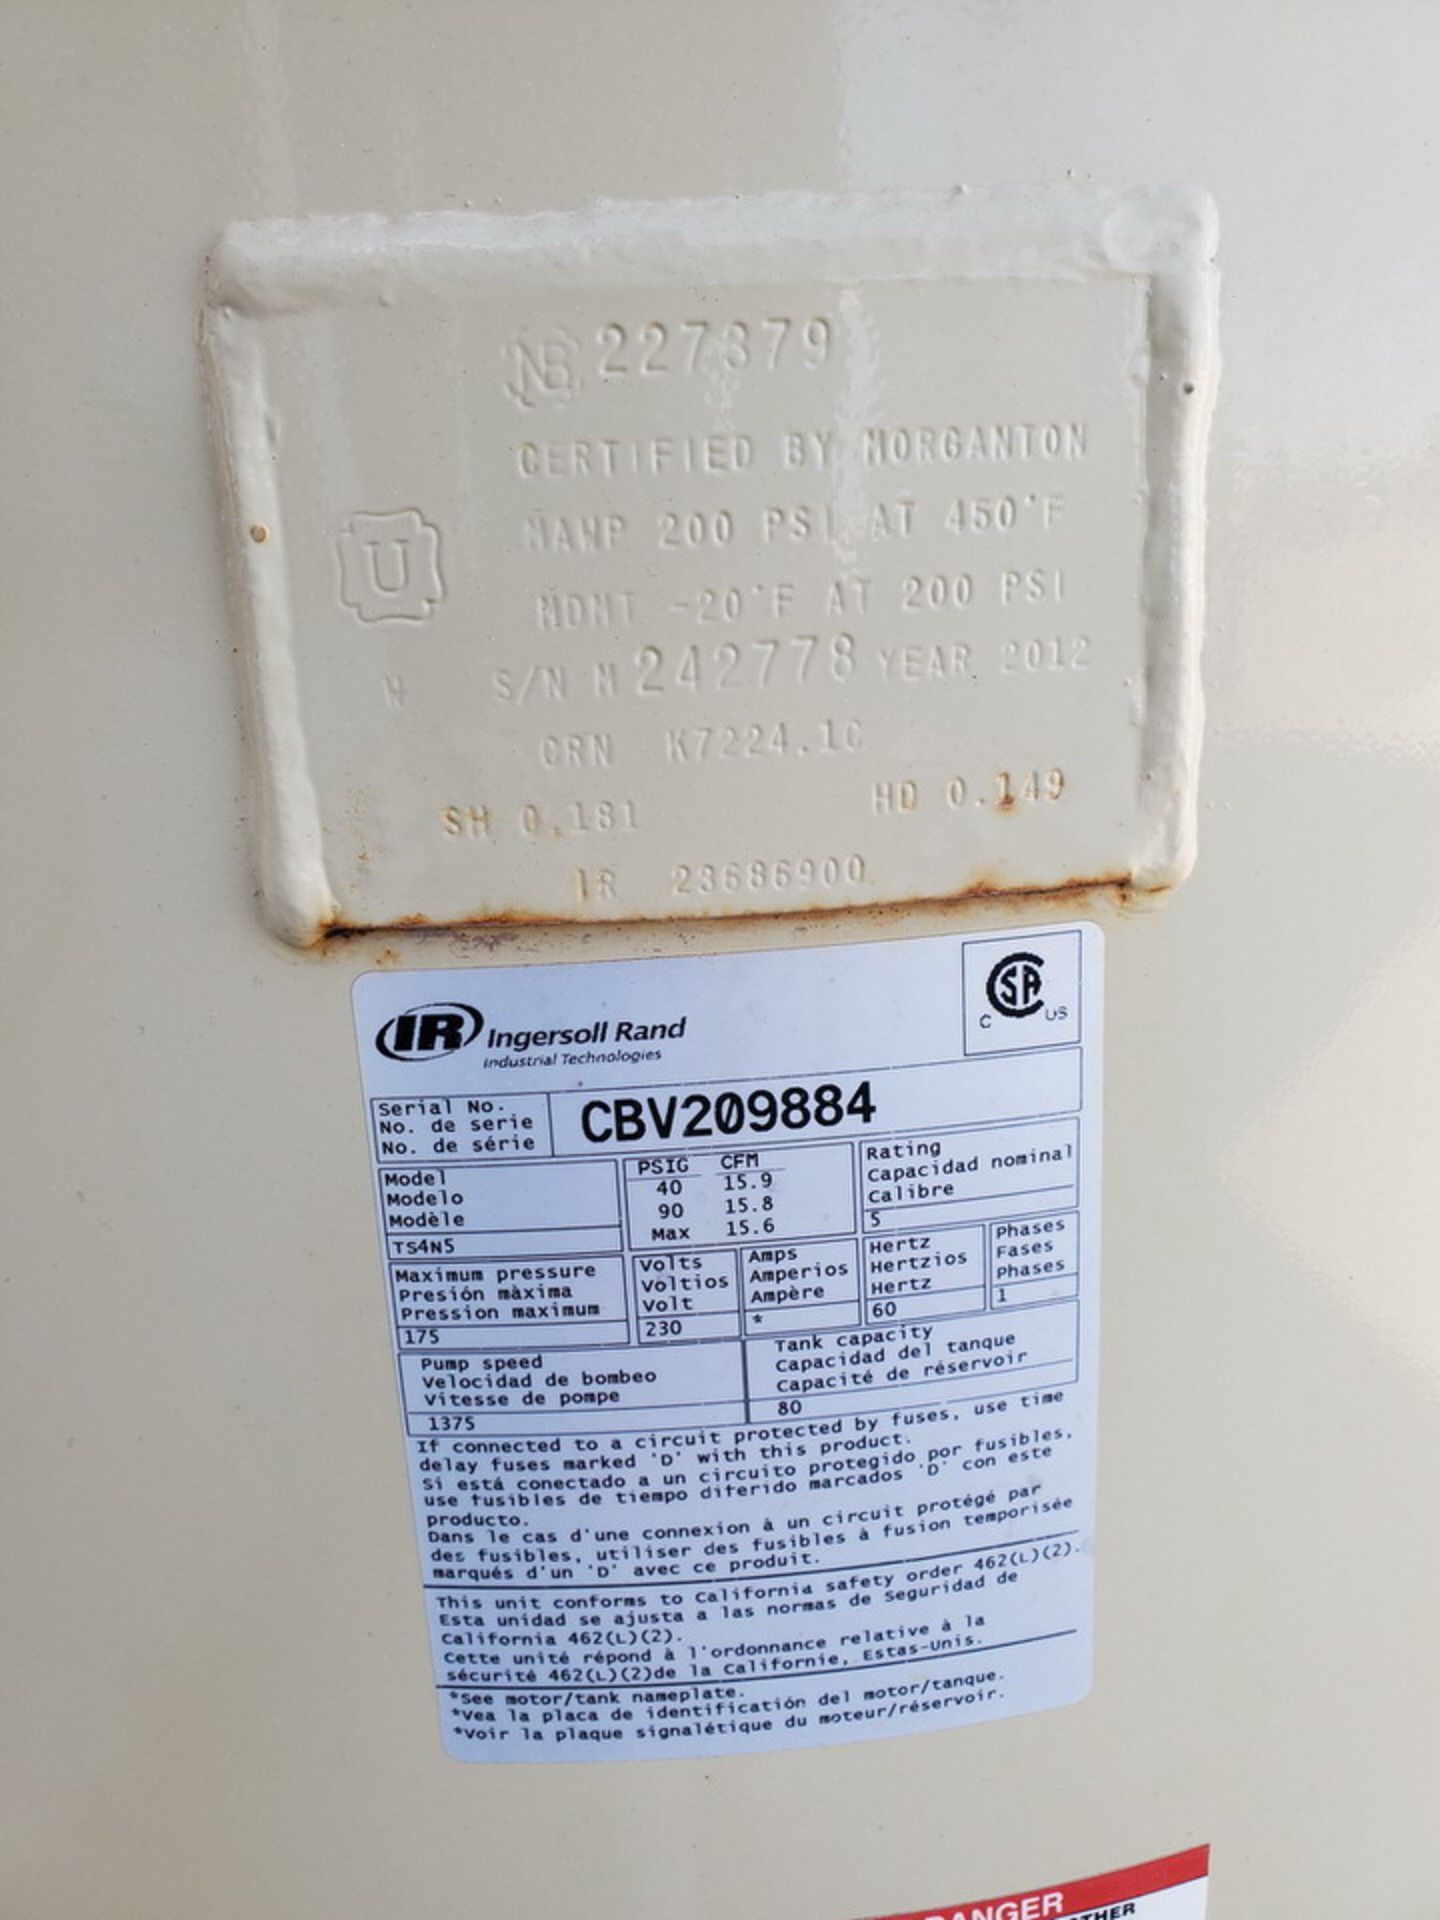 IR TS4N5 Air Compressor 230V, 1PH, 60HZ, MAWP-175psi - Image 9 of 9